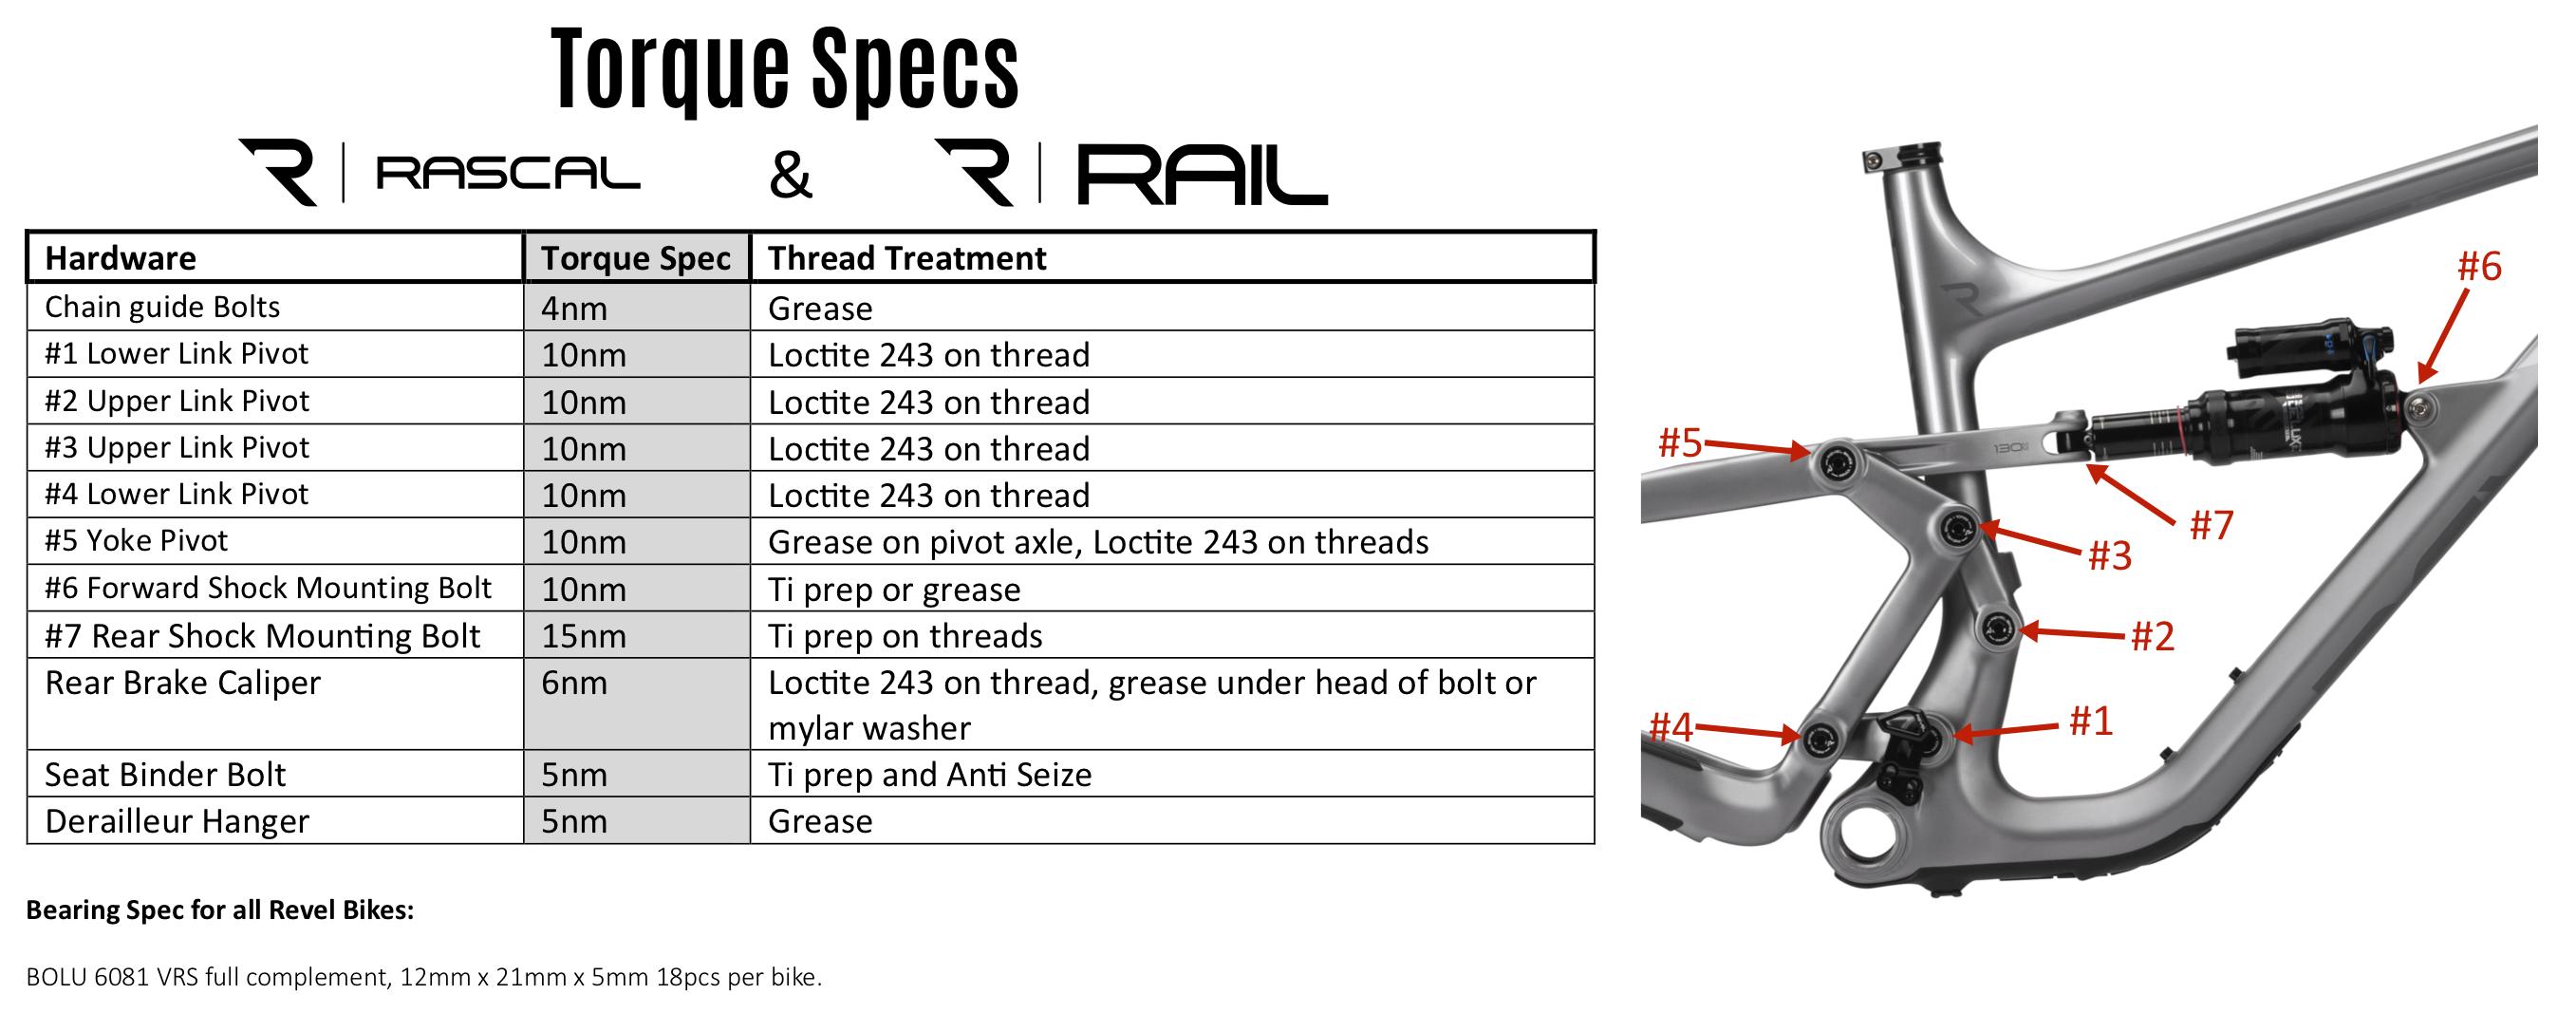 Rascal-and-Rail-Torque-Spec-copy